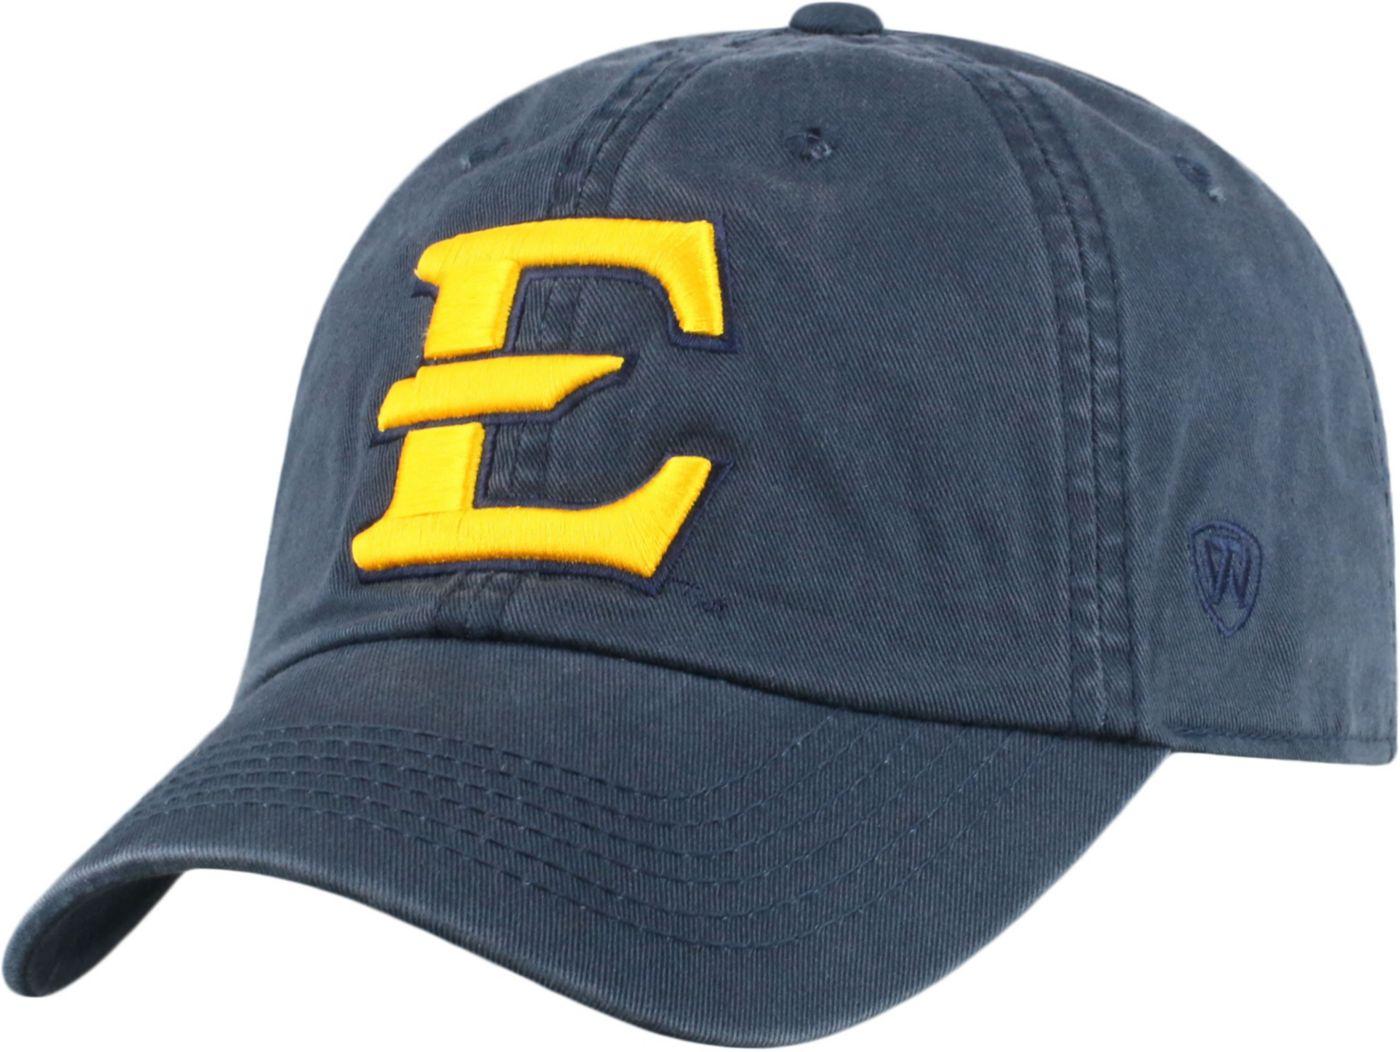 Top of the World Men's East Tennessee State Buccaneers Navy Crew Adjustable Hat